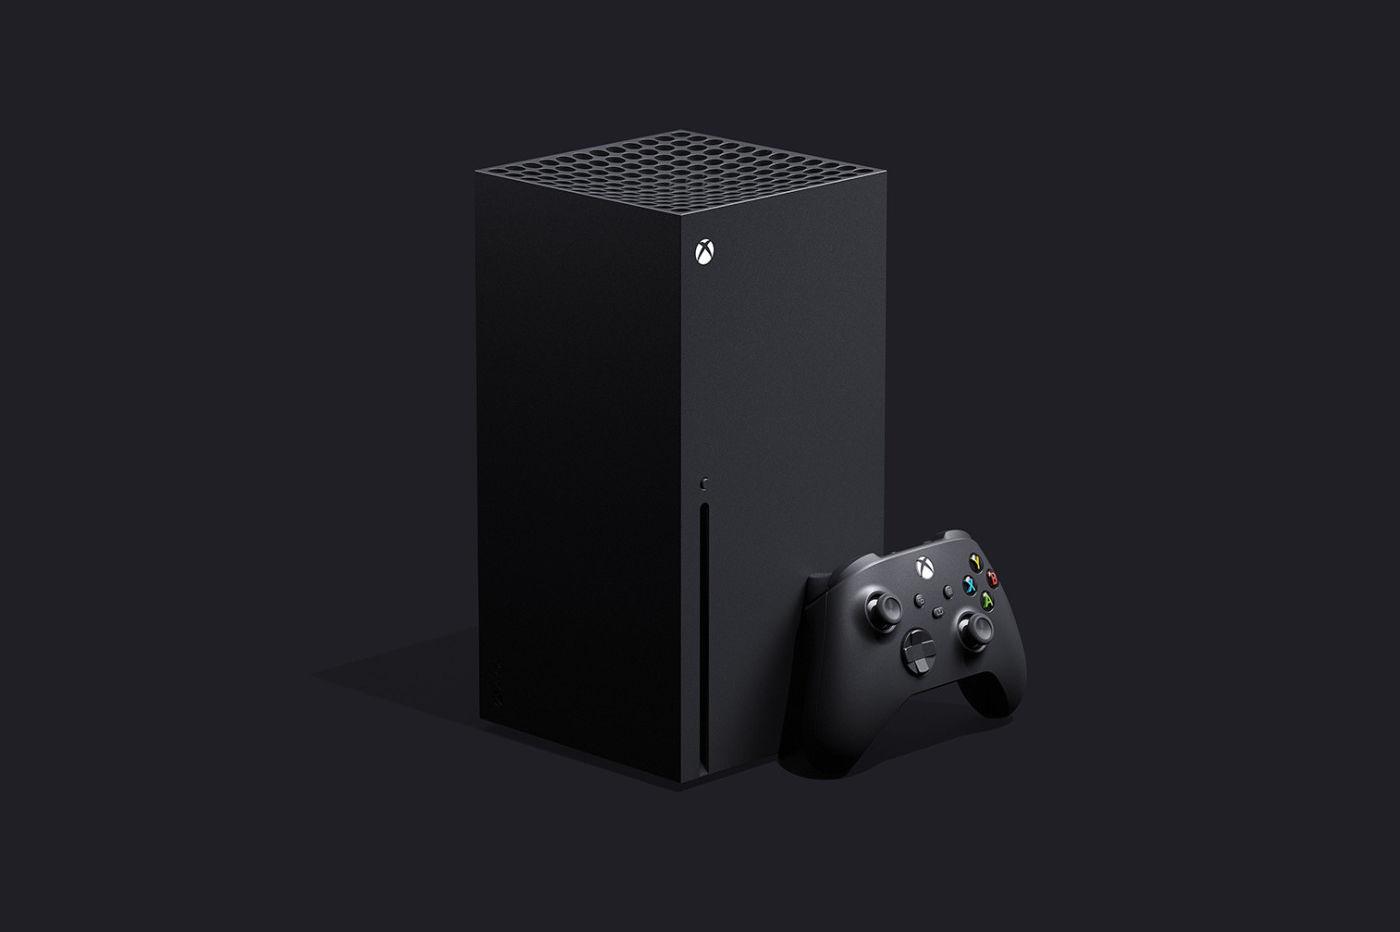 La plateforme de cloud gaming de Microsoft arrivera en septembre